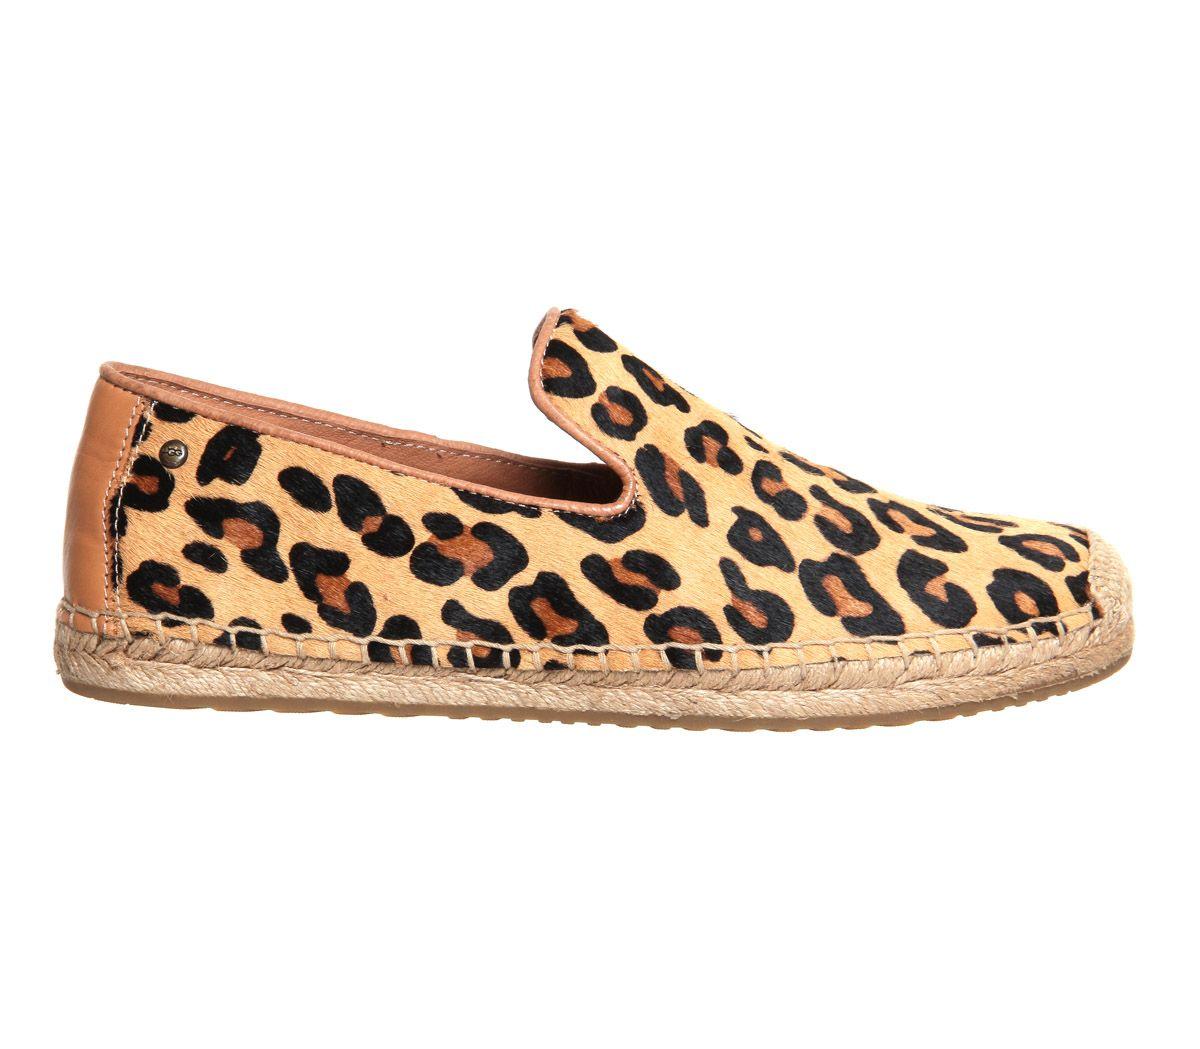 2b36ae67f1c Buy Leopard Calf Hair UGG Australia Sandrinne Espadrille from OFFICE ...